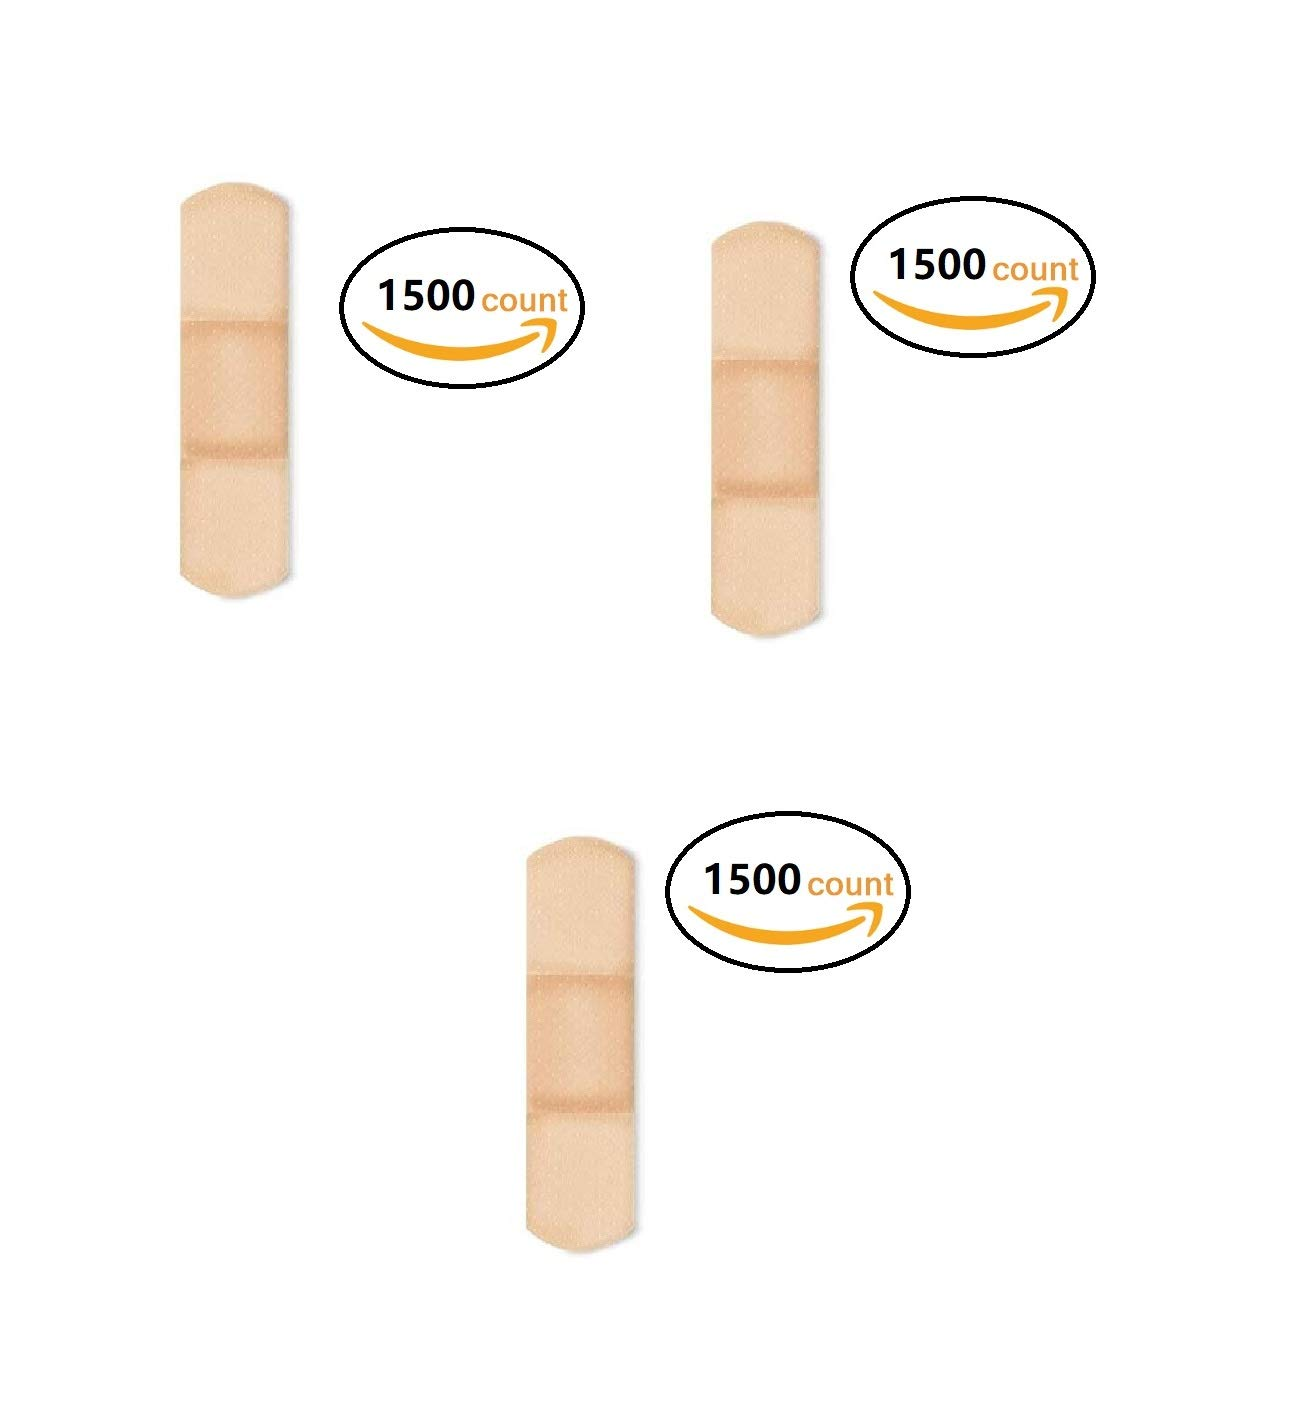 American White Cross 1304000 Sheer Adhesive Strips, Sterile, 3/4'' x 3'' Bulk, (3 Pack (1500 Count))